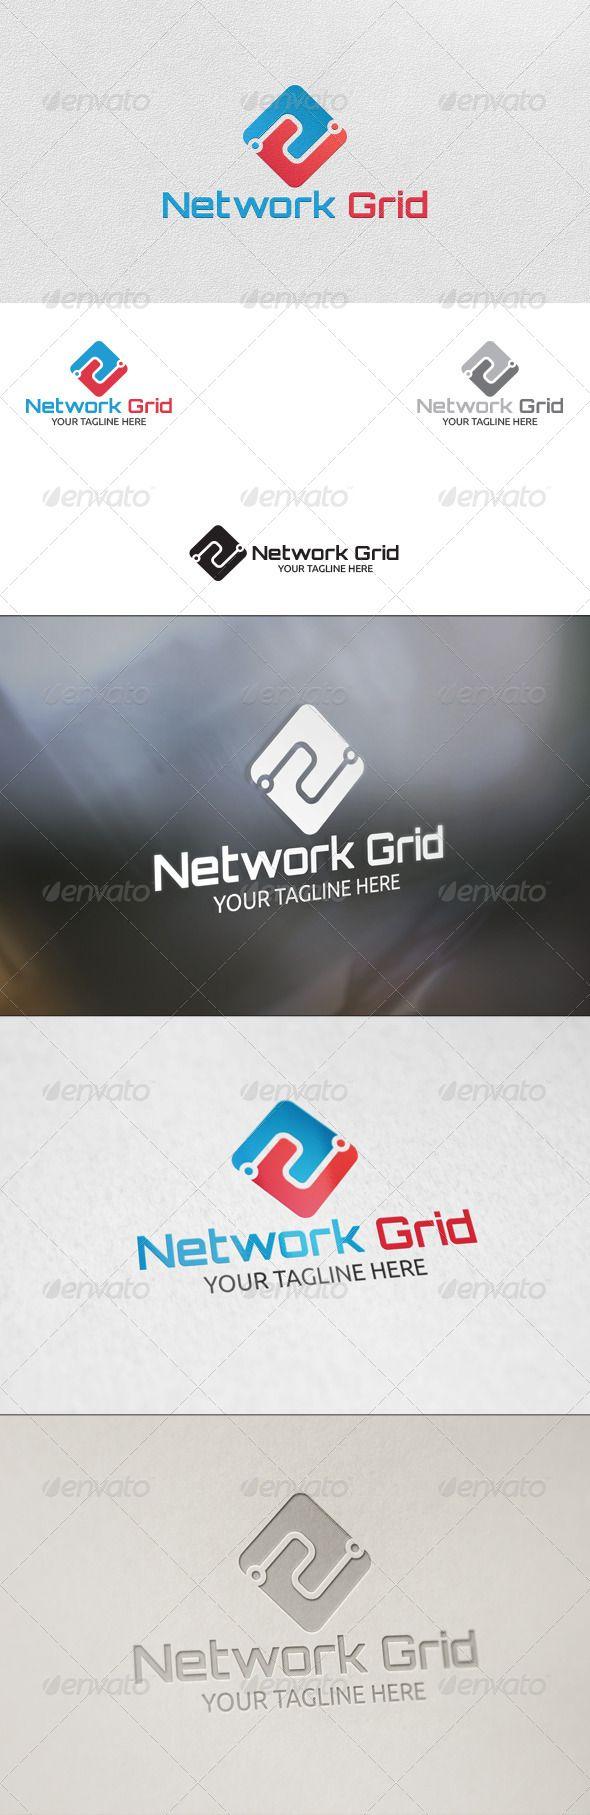 Logosmartz custom logo maker 5 0 review and download - Network Grid Logo Design Template Vector Logotype Download It Here Http